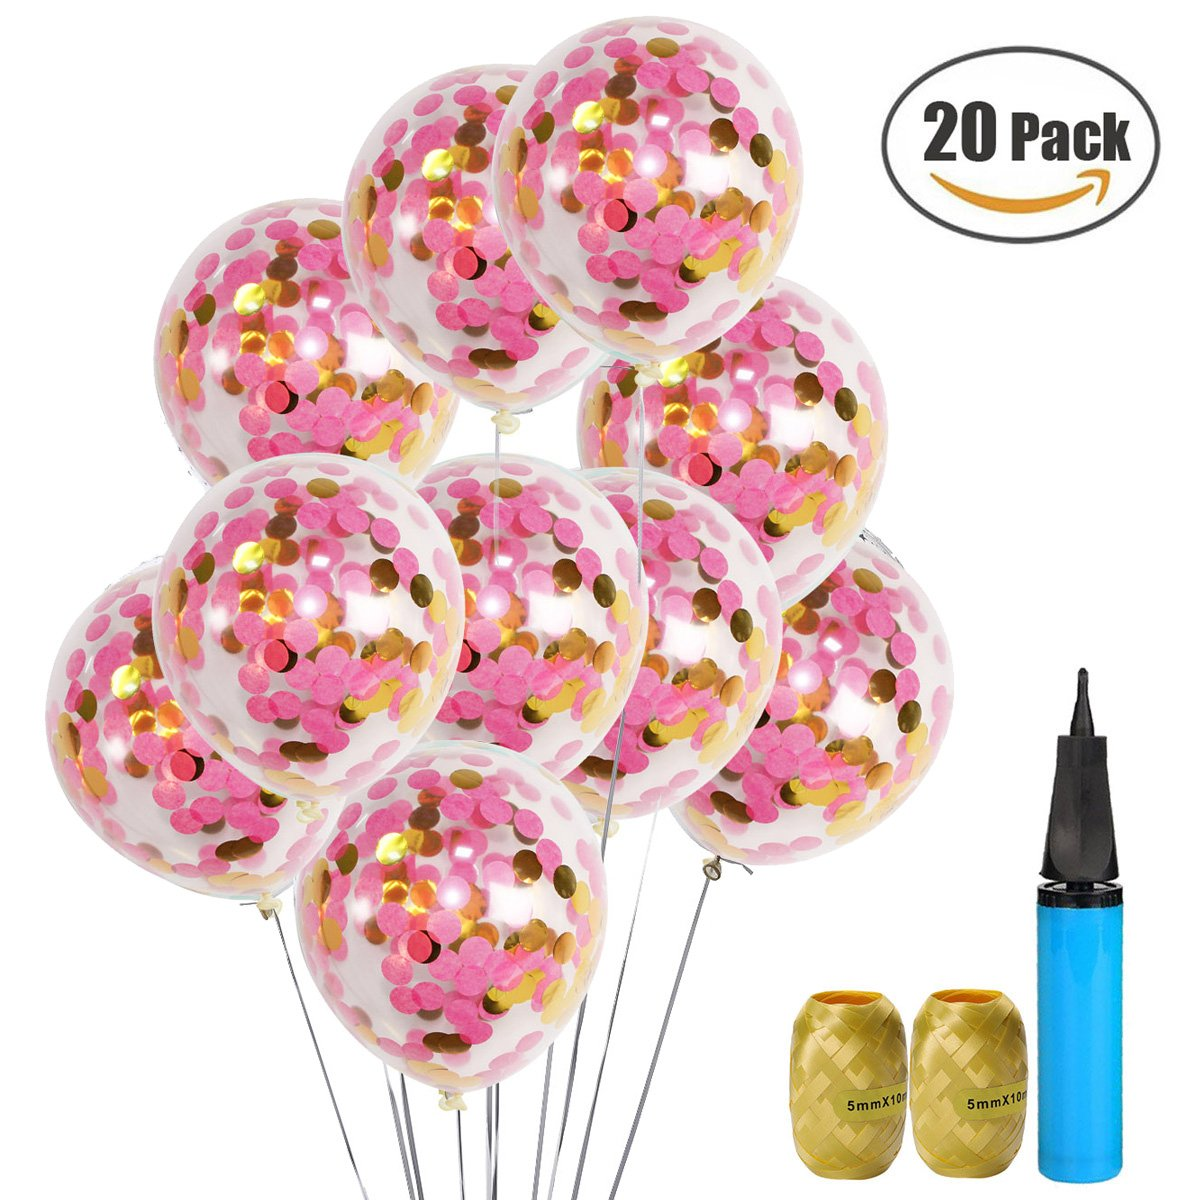 Cheap Pink Hot Air Balloons, find Pink Hot Air Balloons deals on ...